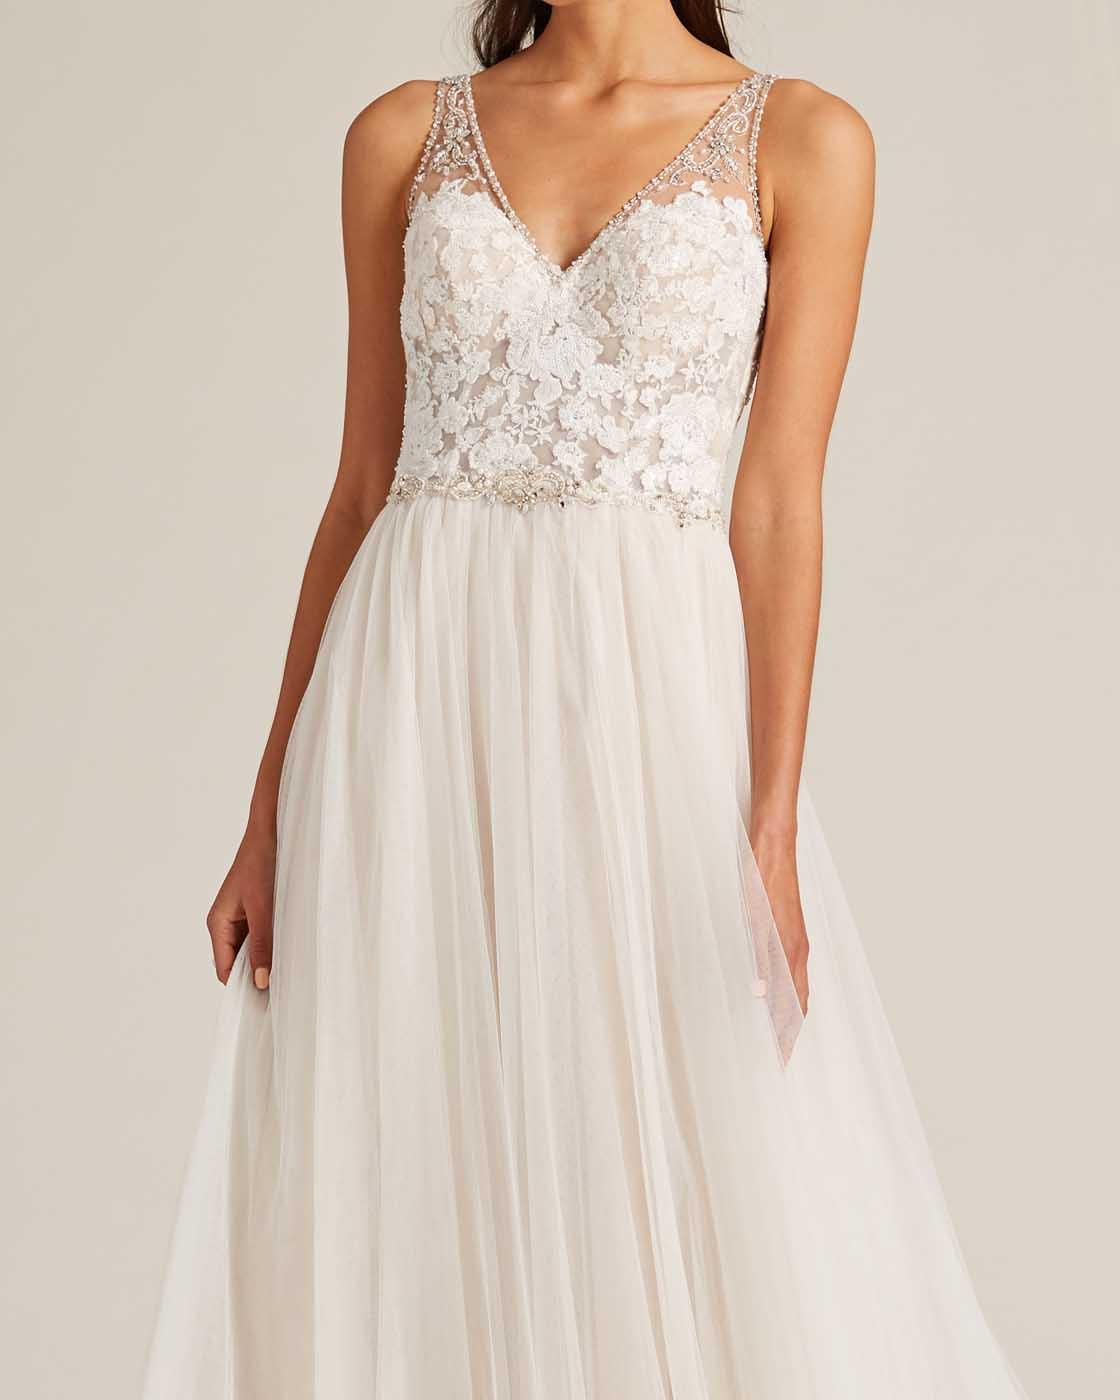 Blush Embroidered Top Wedding Dress - Detail